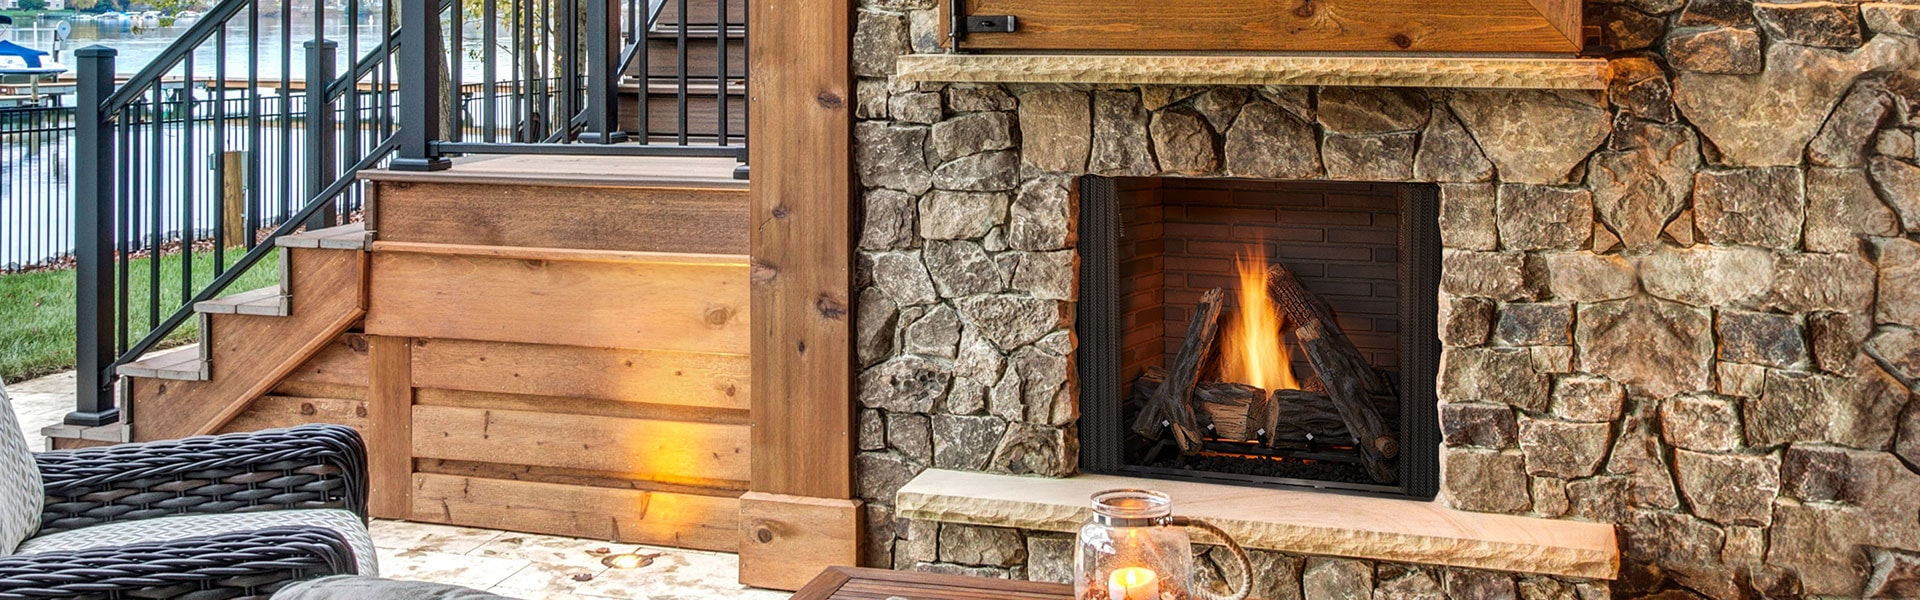 courtyard36 premtradbrick hi def logs 1920x600